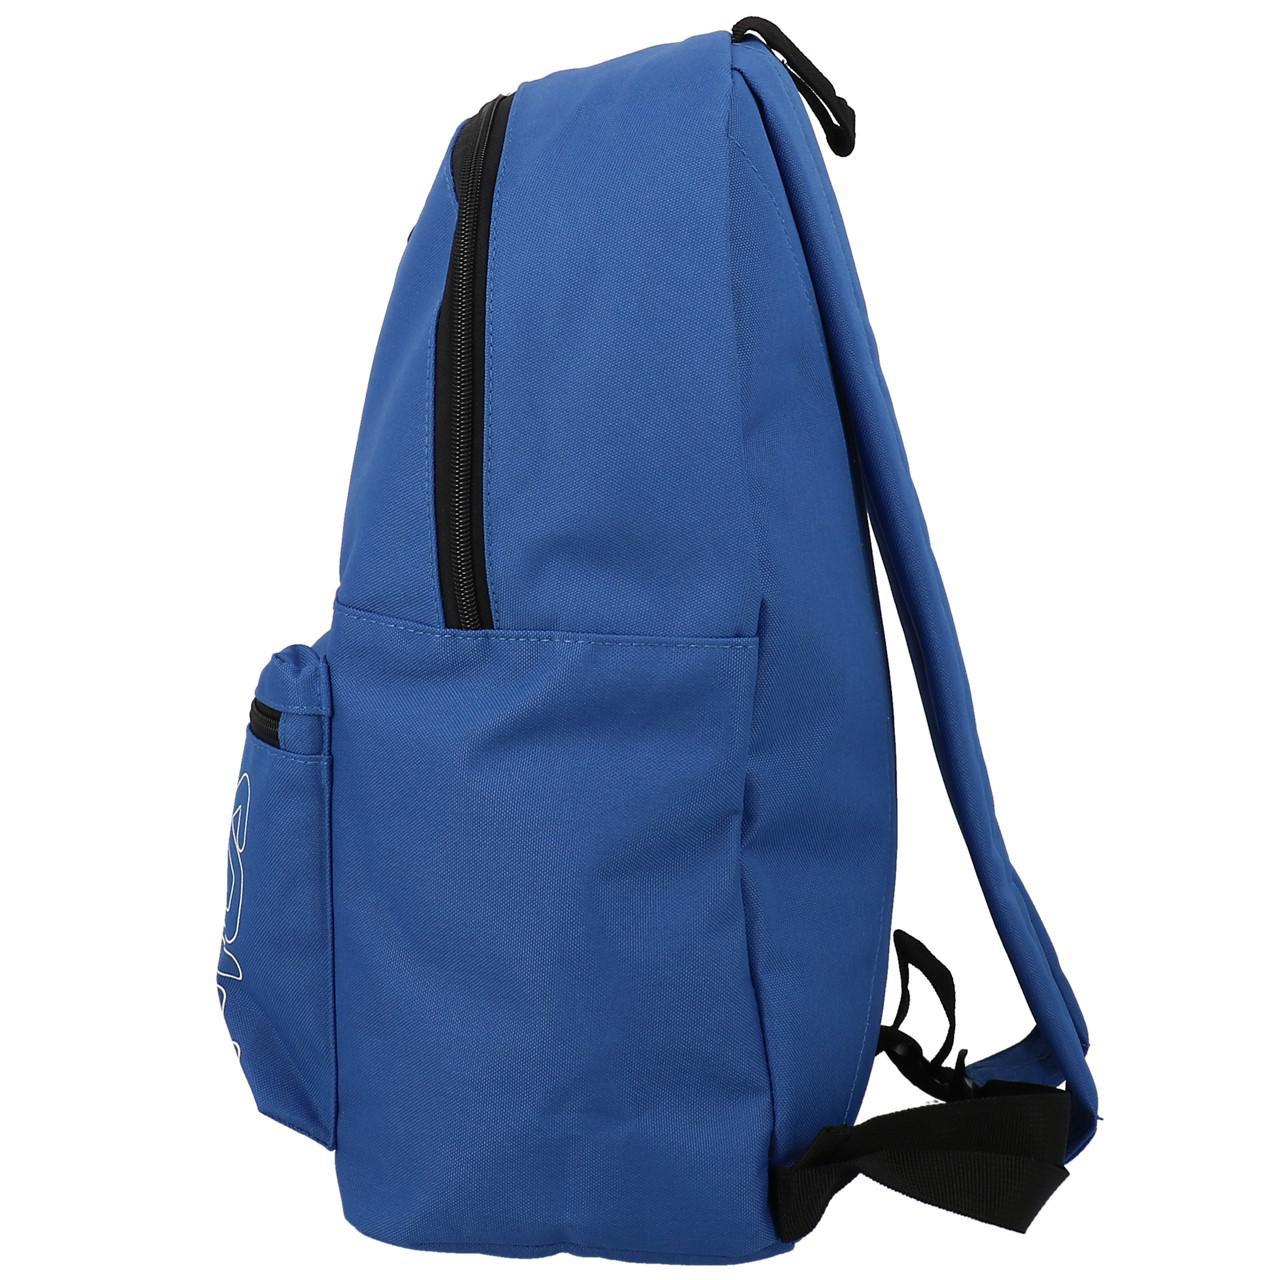 Sac-a-dos-college-Fila-Backpack-sxcool-bleu-Bleu-48131-Neuf miniature 2